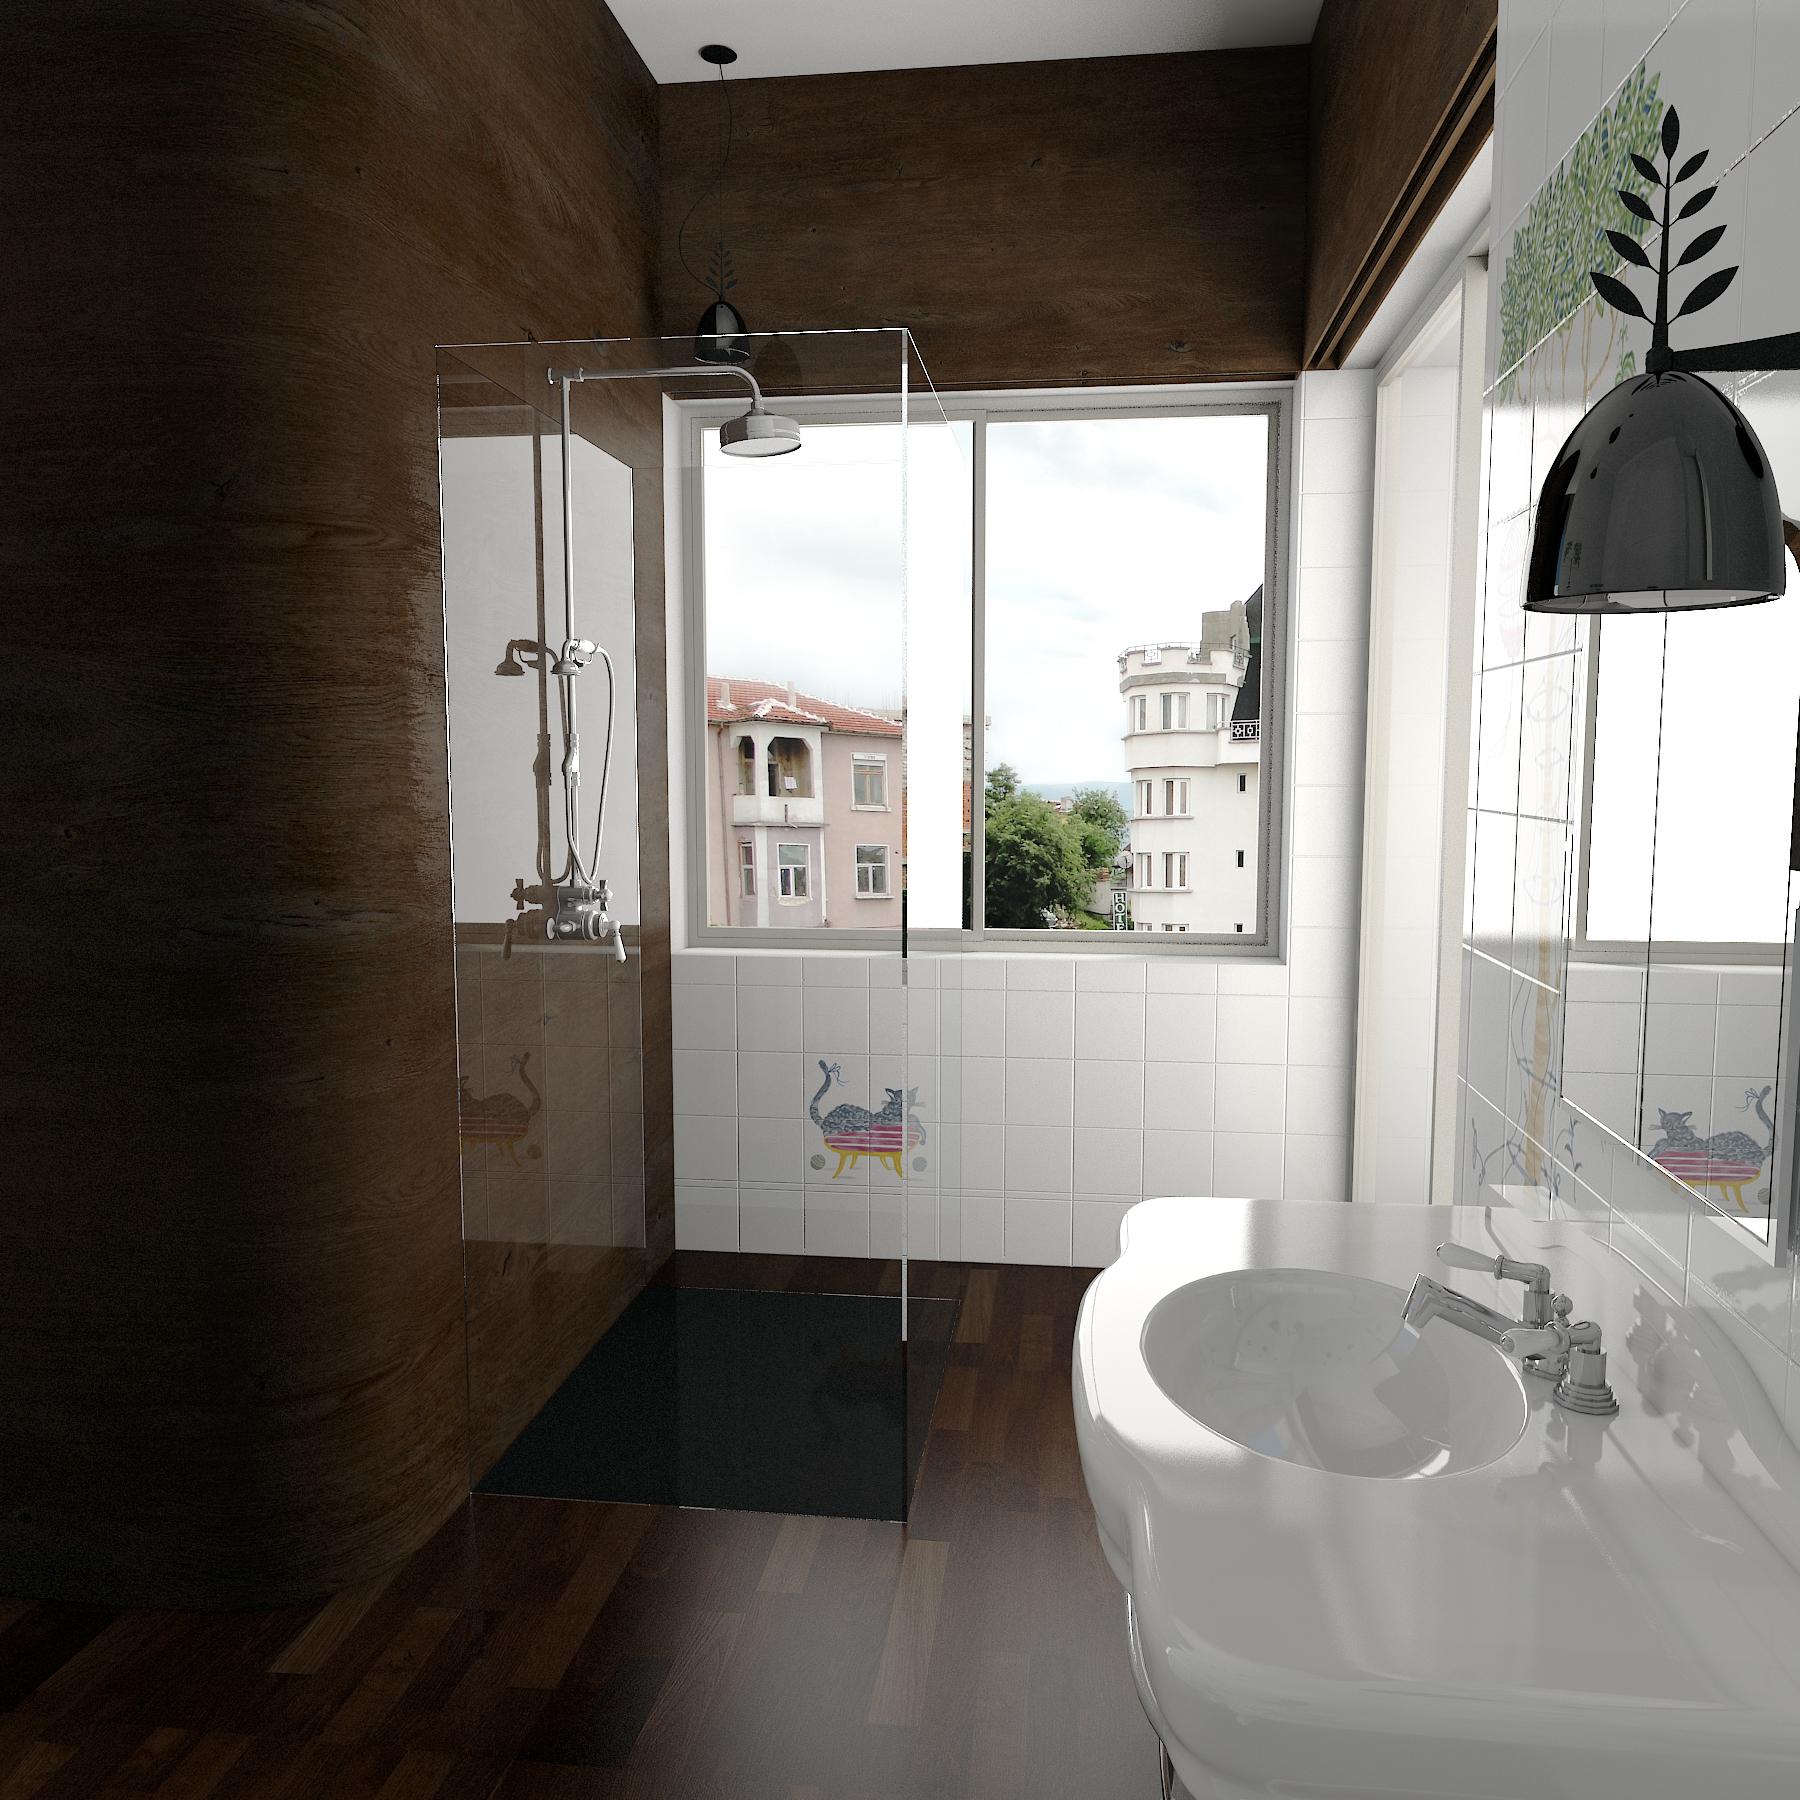 presentation_Parallel House_14.jpg